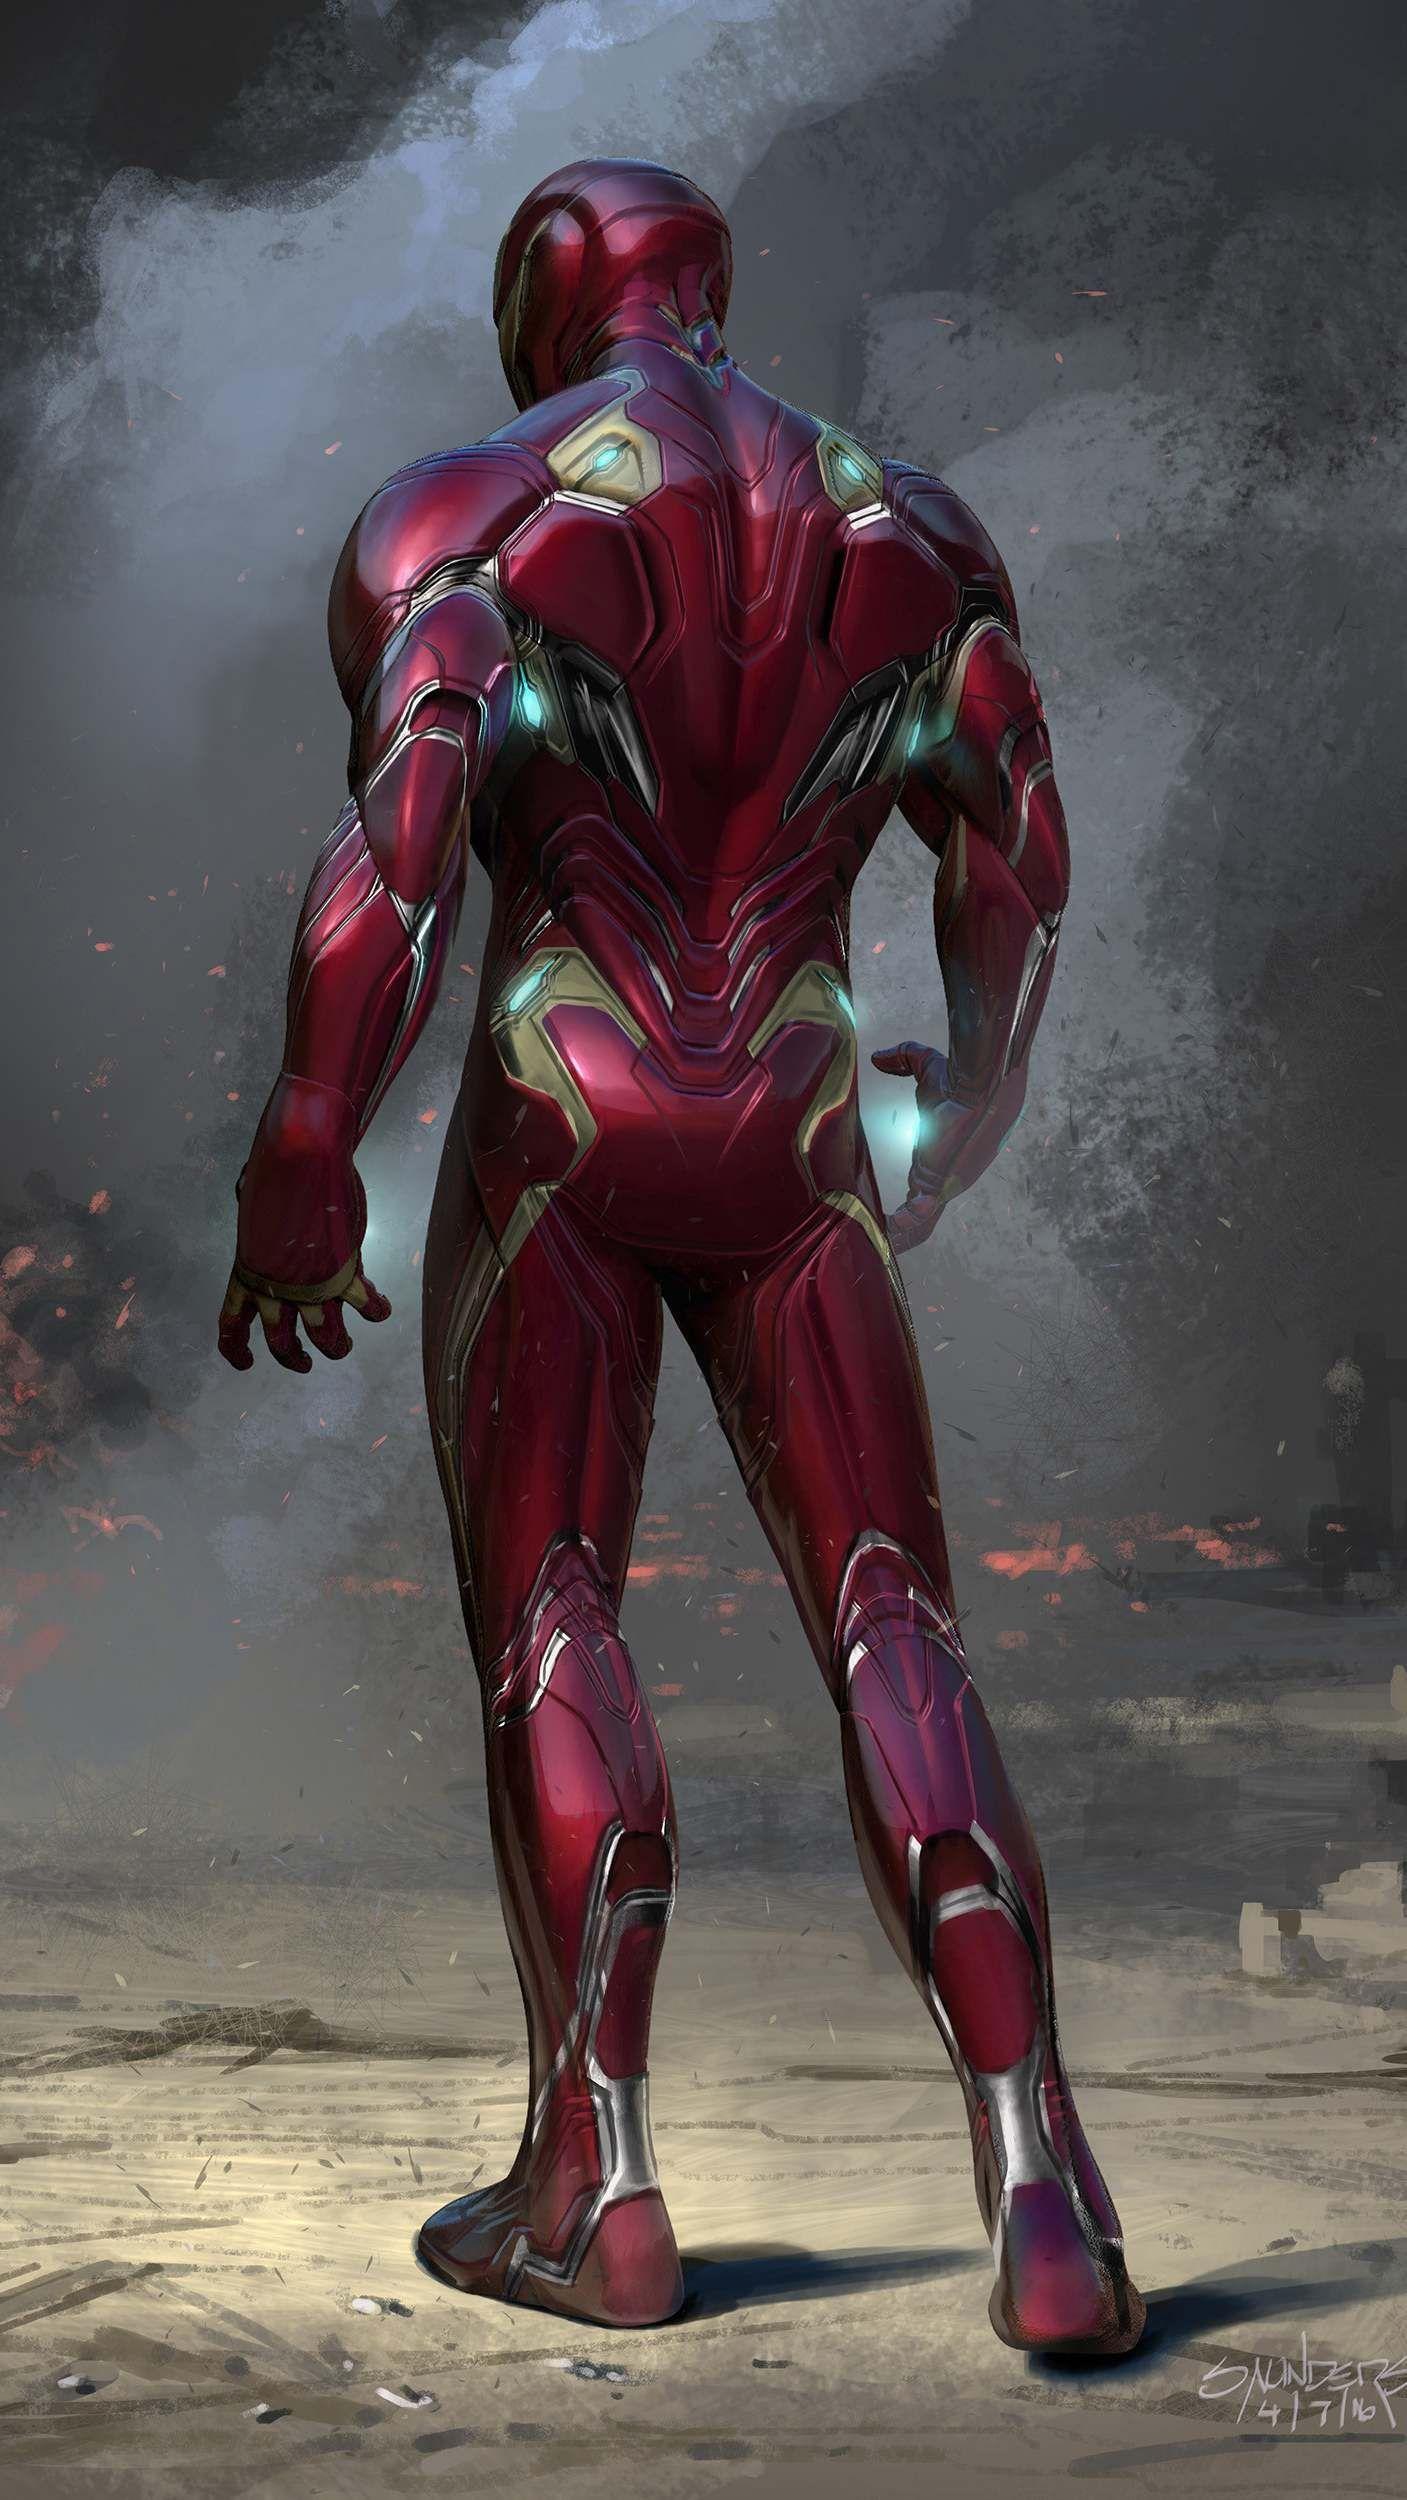 Nano Tech Suit Iron Man Iphone Wallpaper Spiderman Marvel Iron Iron Man Wallpaper Iron Man Armor Iron Man Avengers